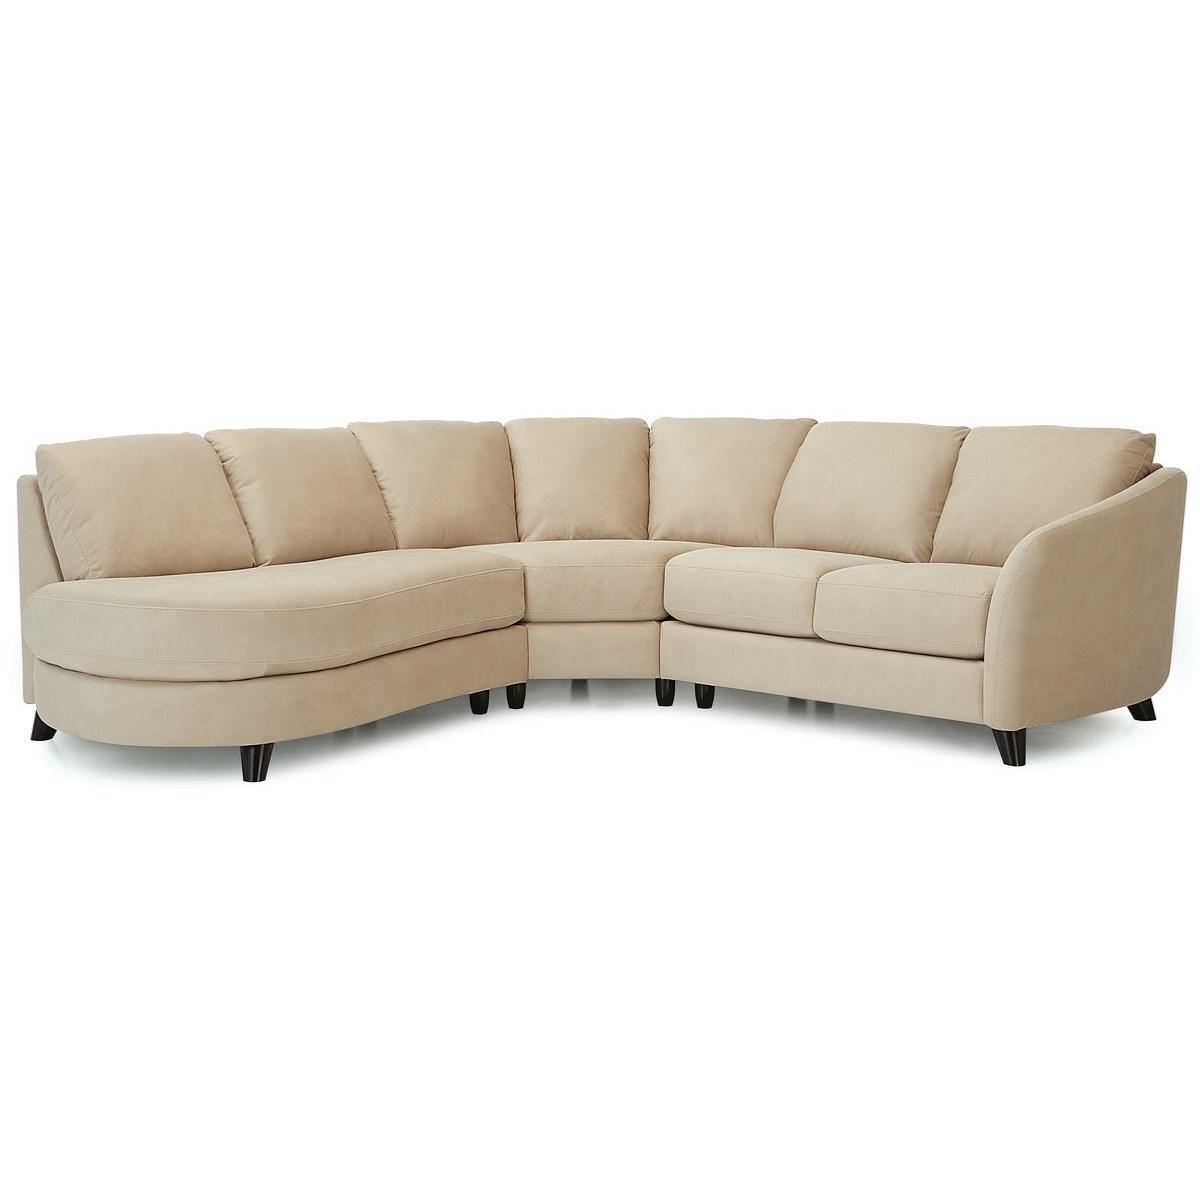 Alula Sectional Sofa by Palliser at Jordan's Home Furnishings